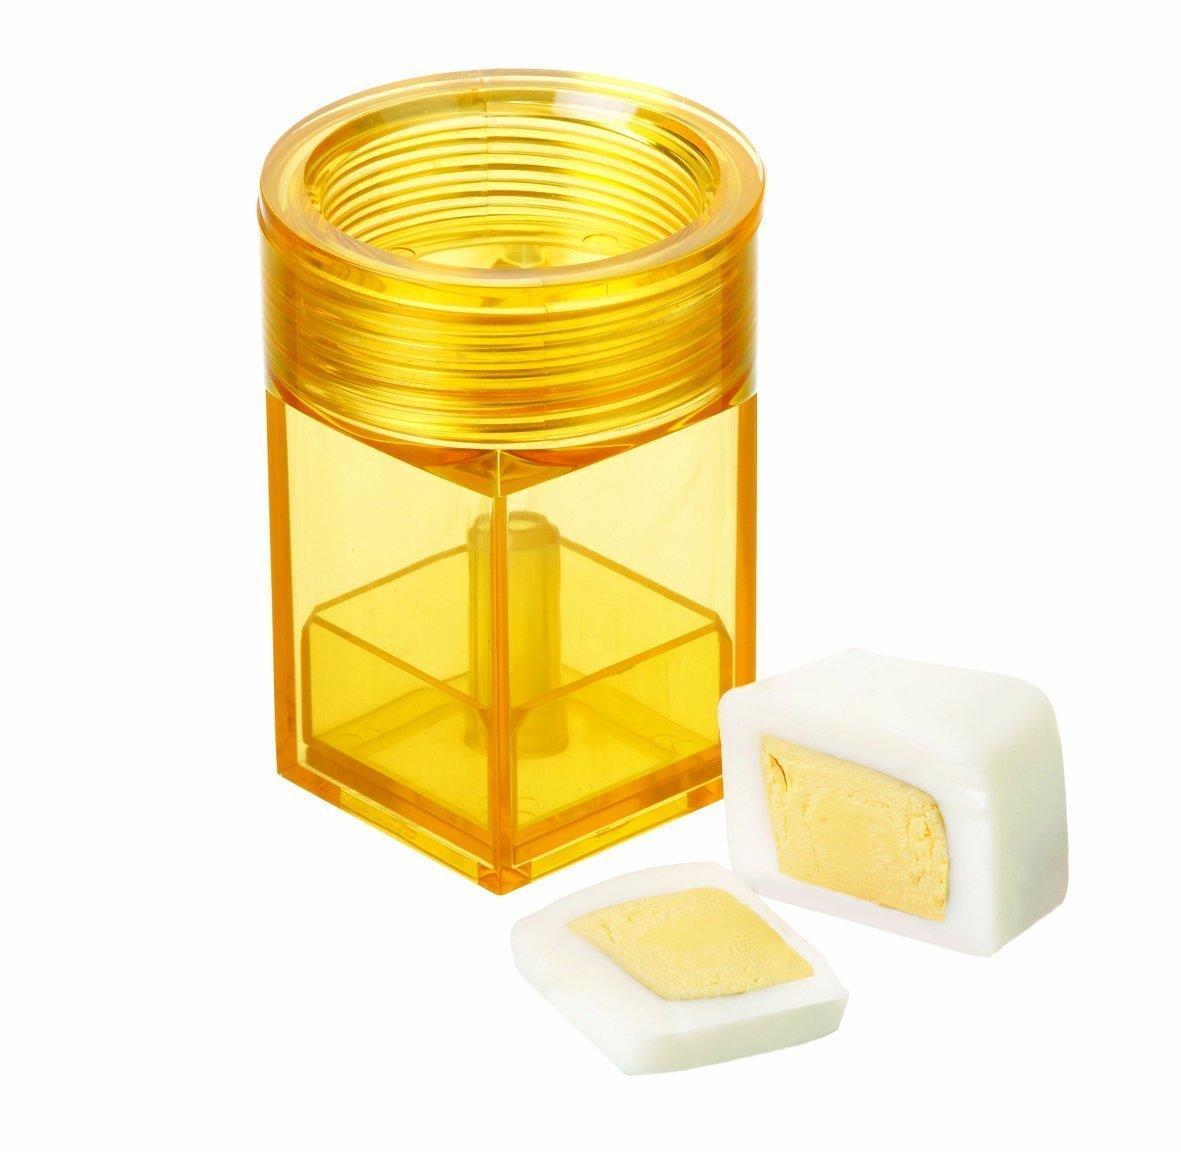 Egg Cuber, Simple to use Eddingtons